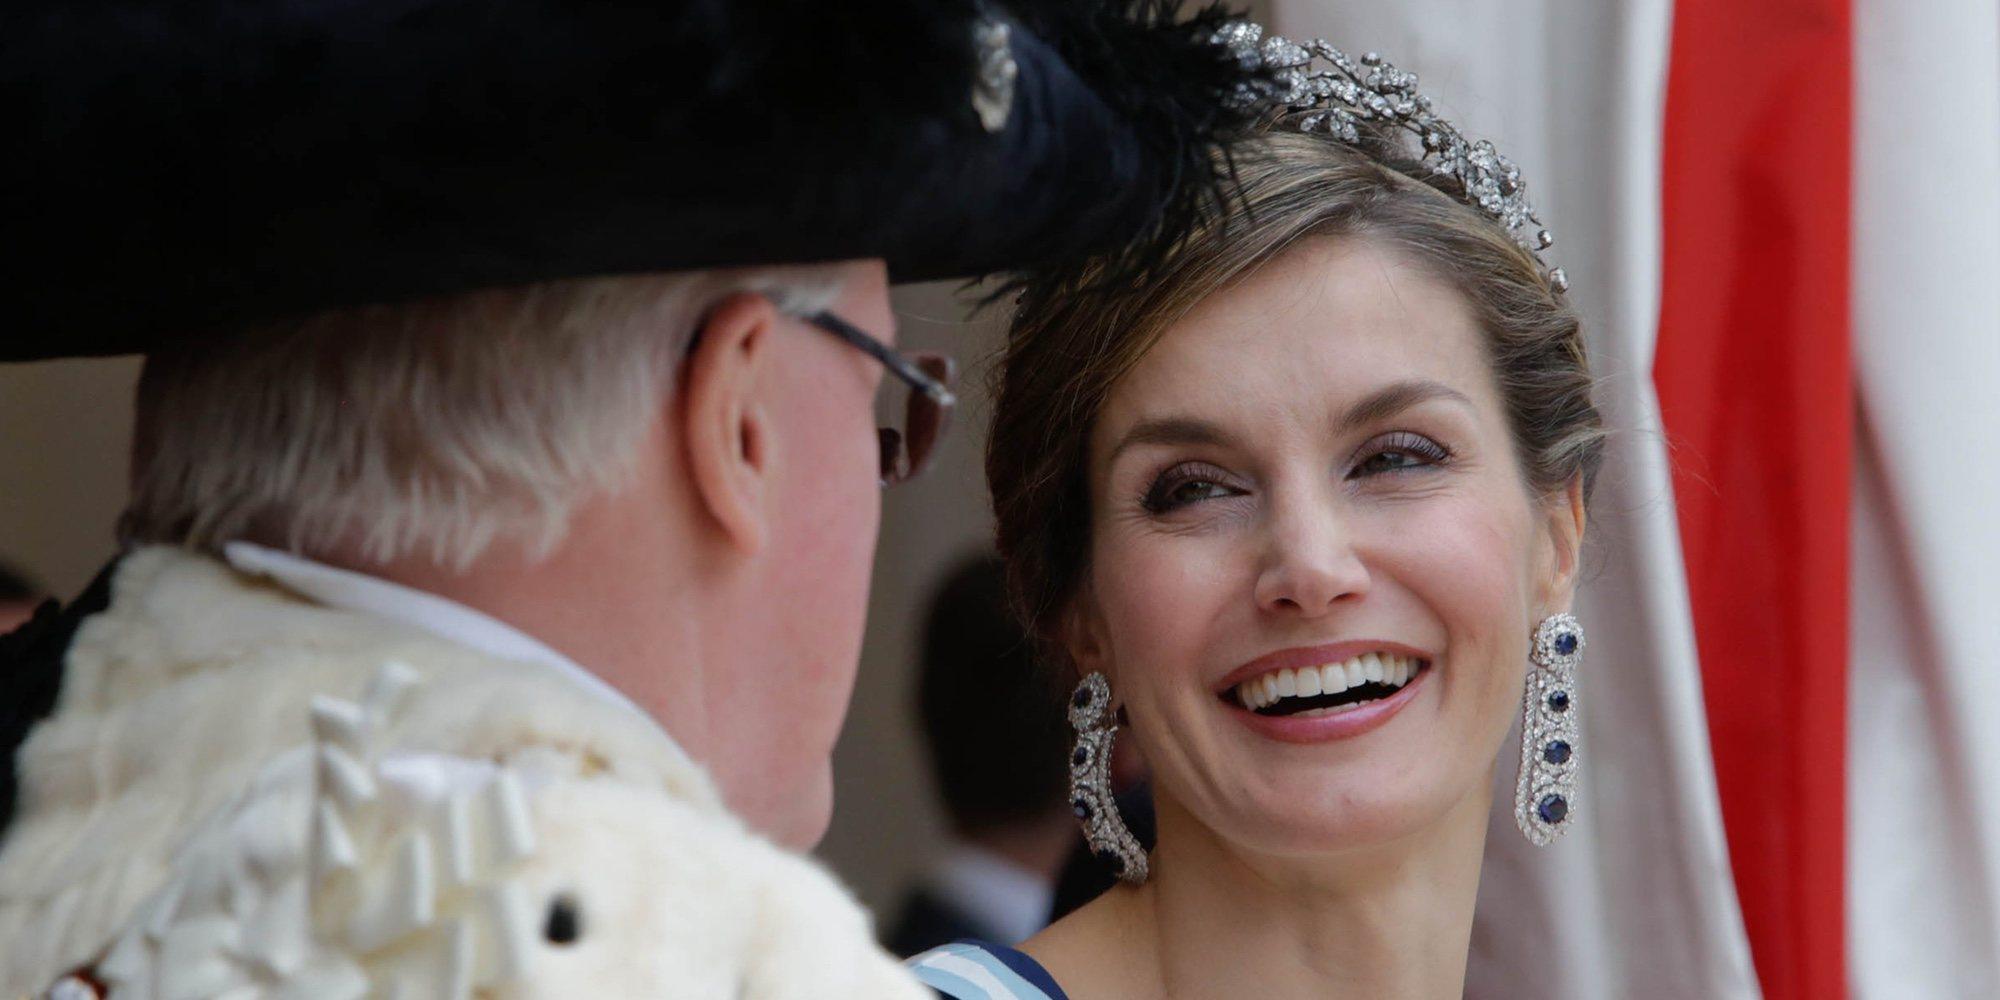 Los imperdonables errores de la prensa extranjera con la vida de la Reina Letizia